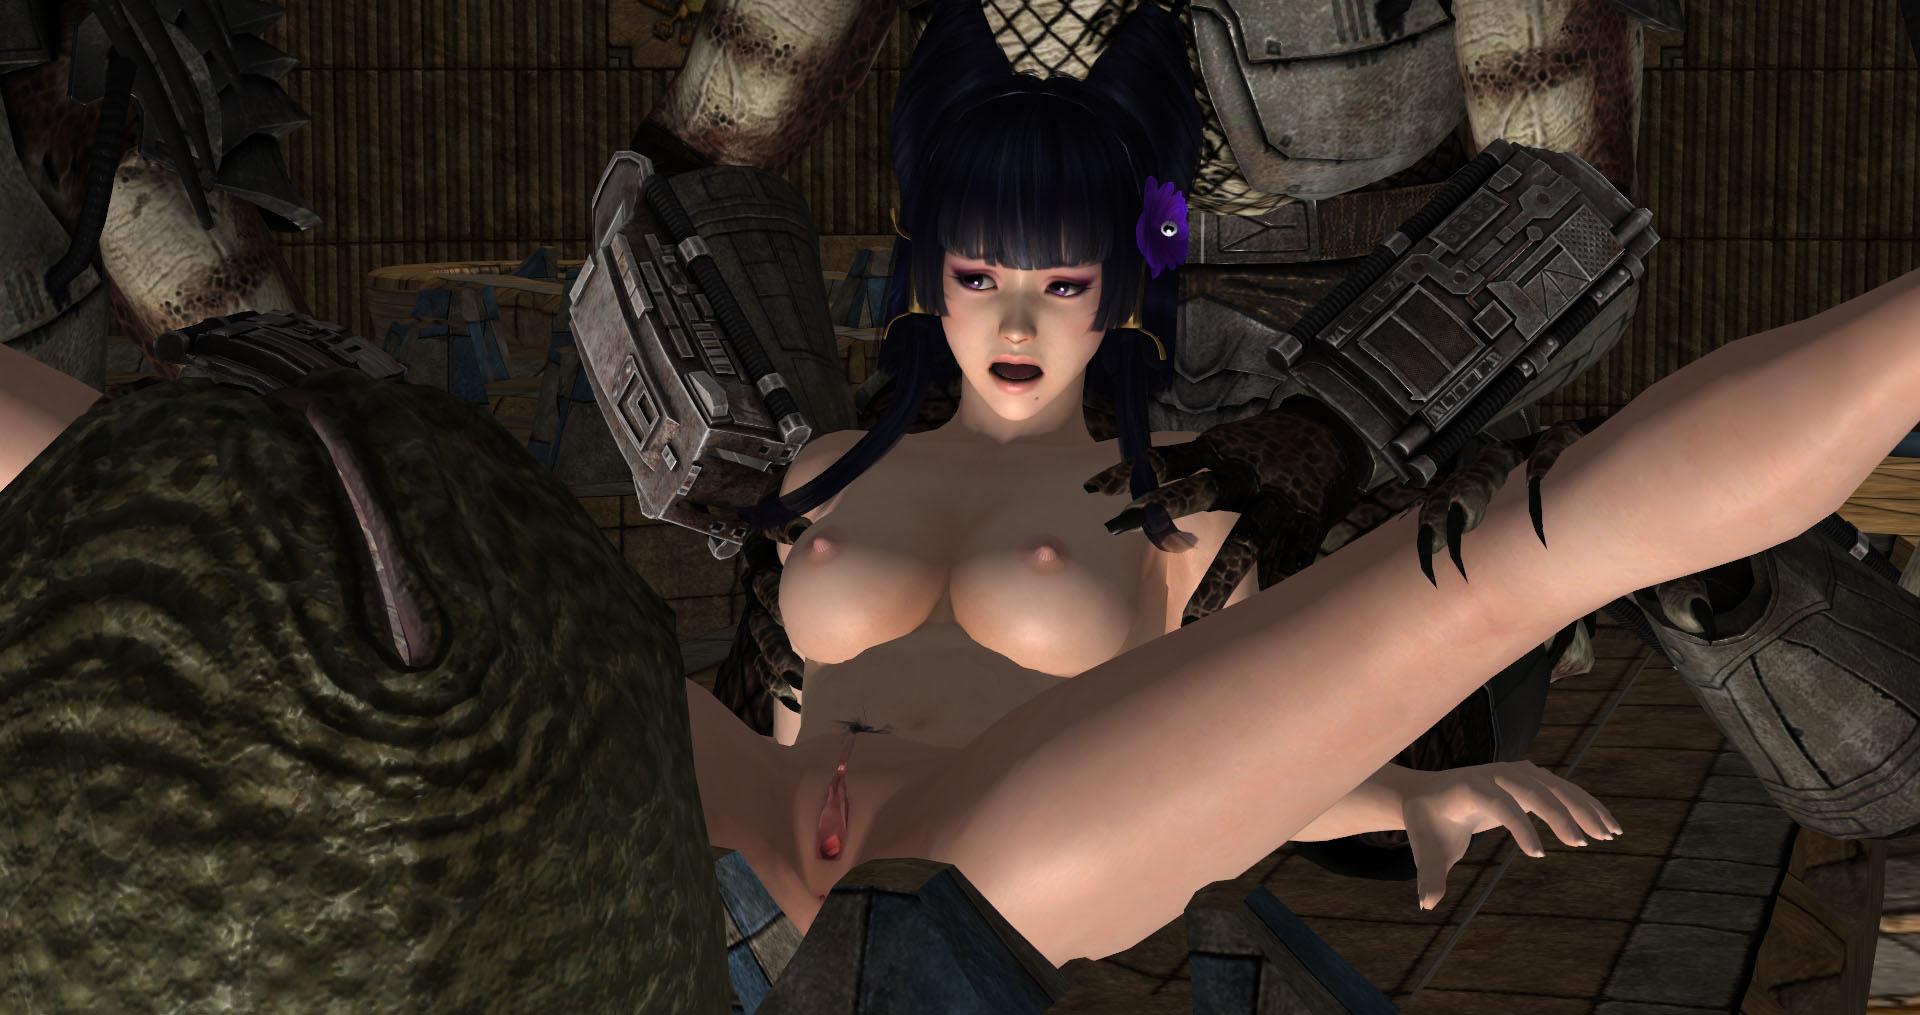 nyotengu_sacrifice_to_pussy_hugger_0077_layer_9_by_bitemonsters-dbgzcl4.jpg